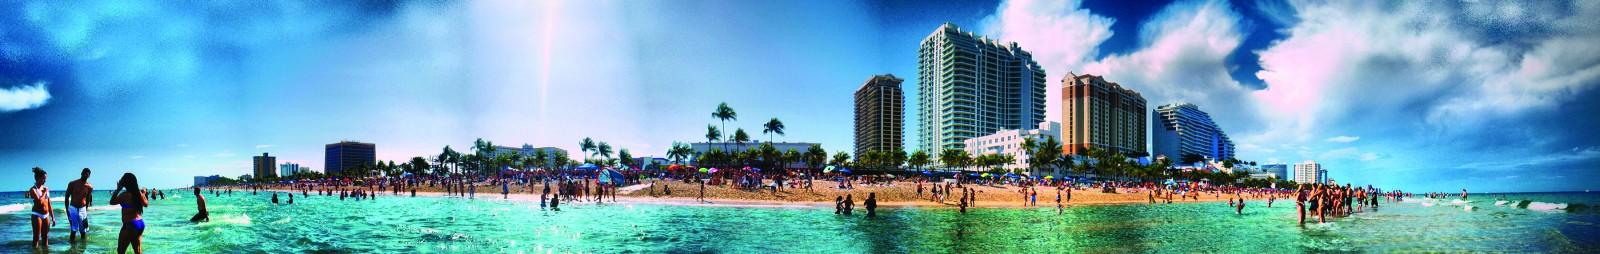 A19 CREW EYE nino Fort Lauderdale beach